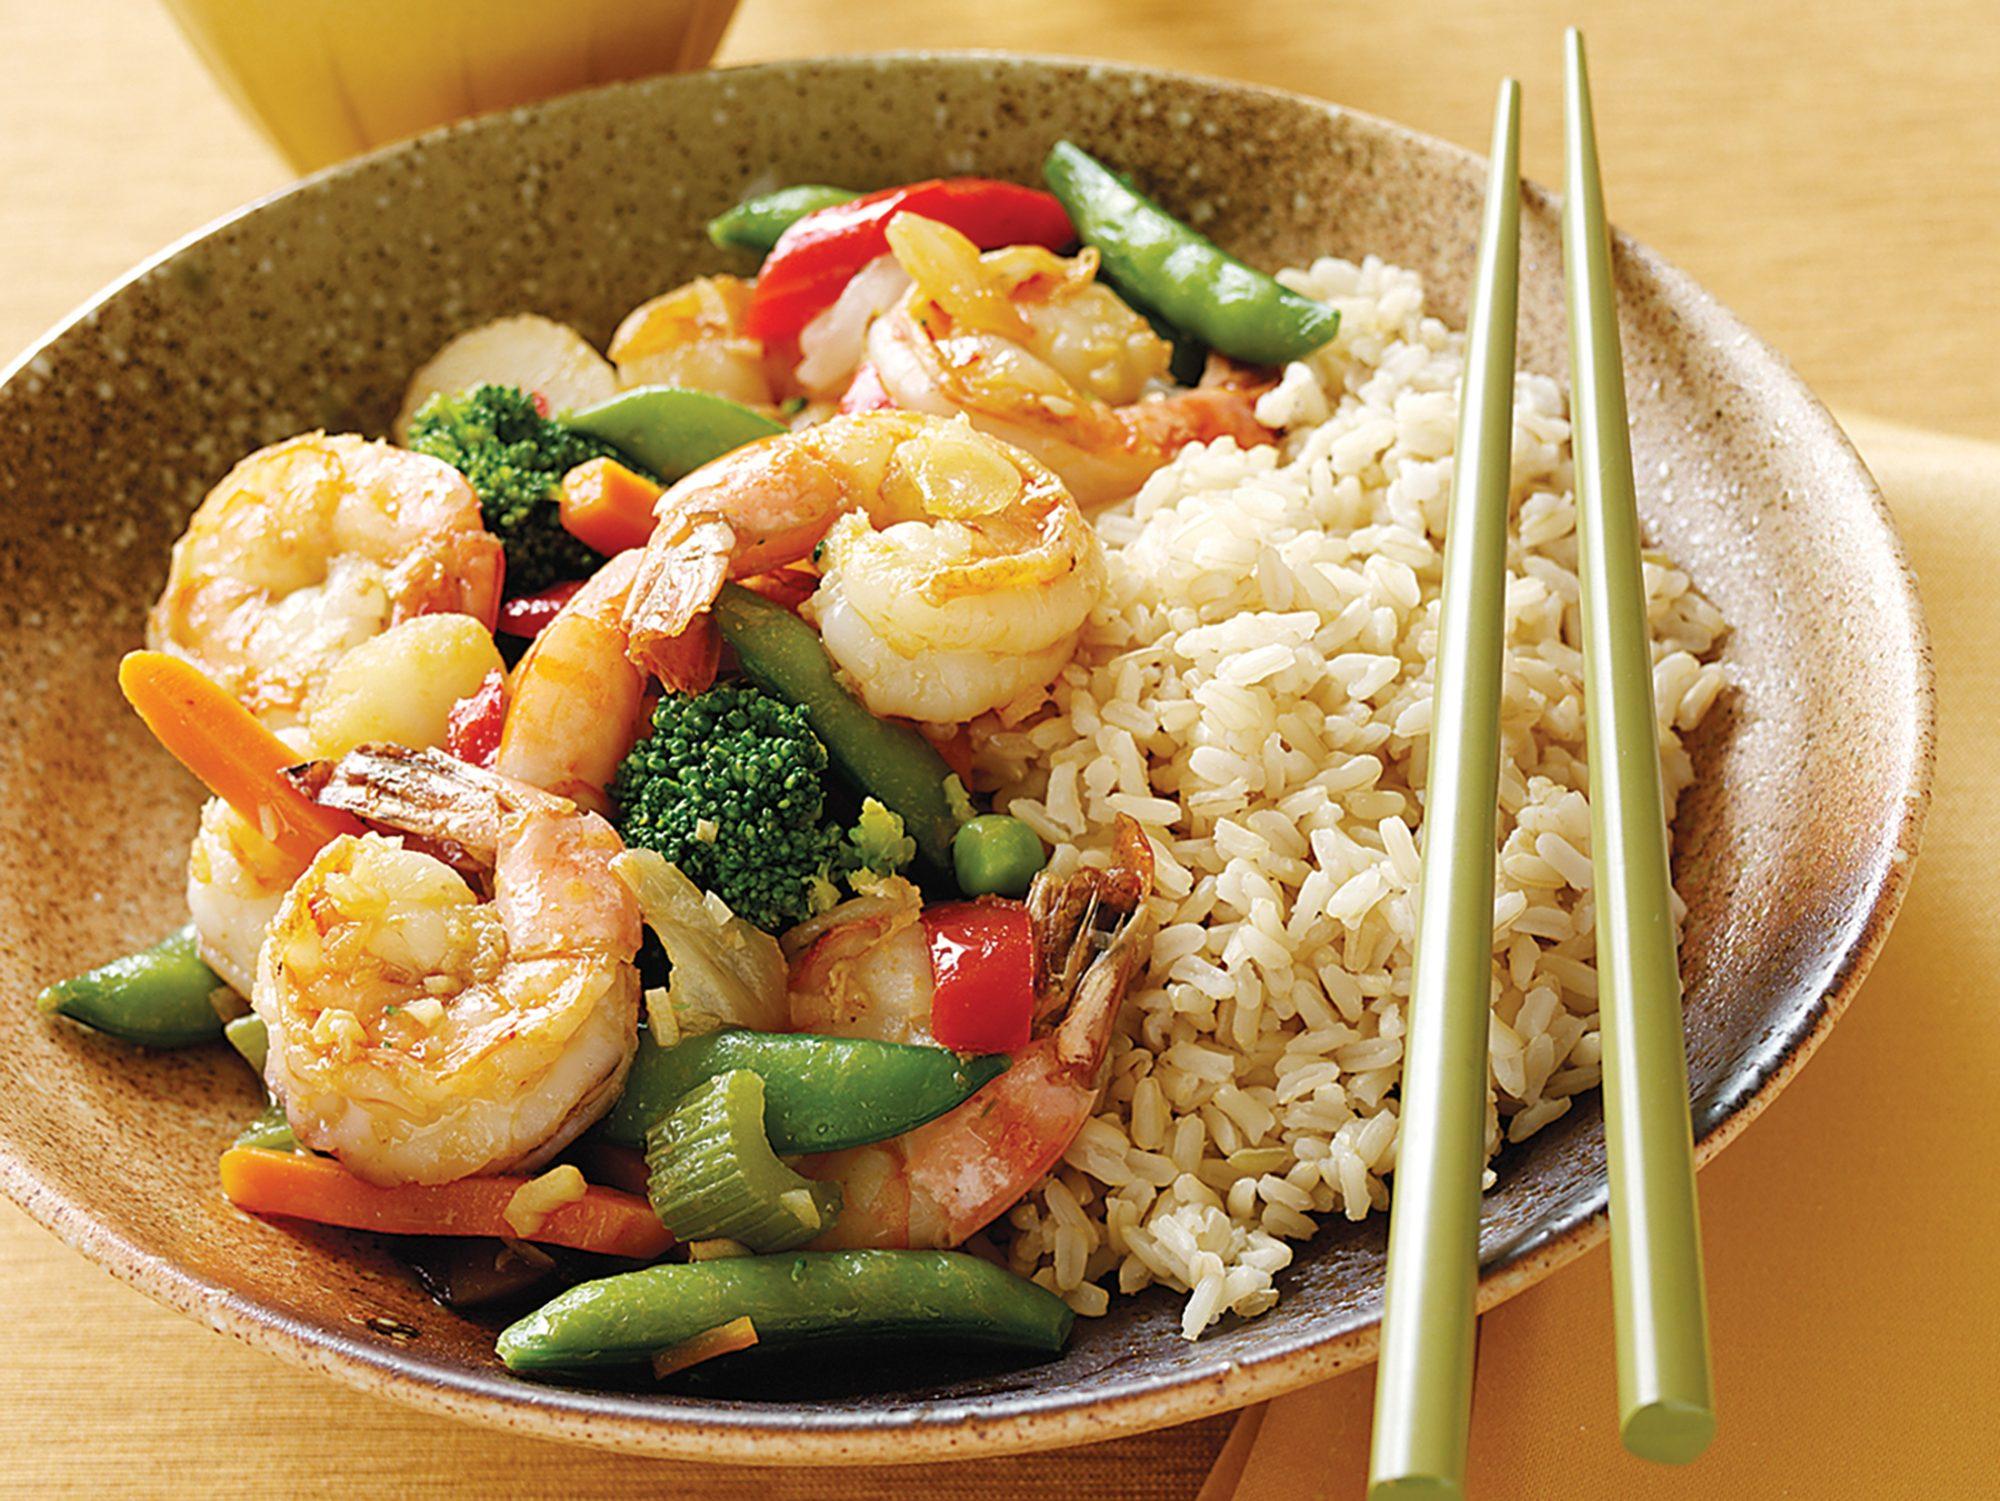 Shrimp and Vegetable Stir-Fry